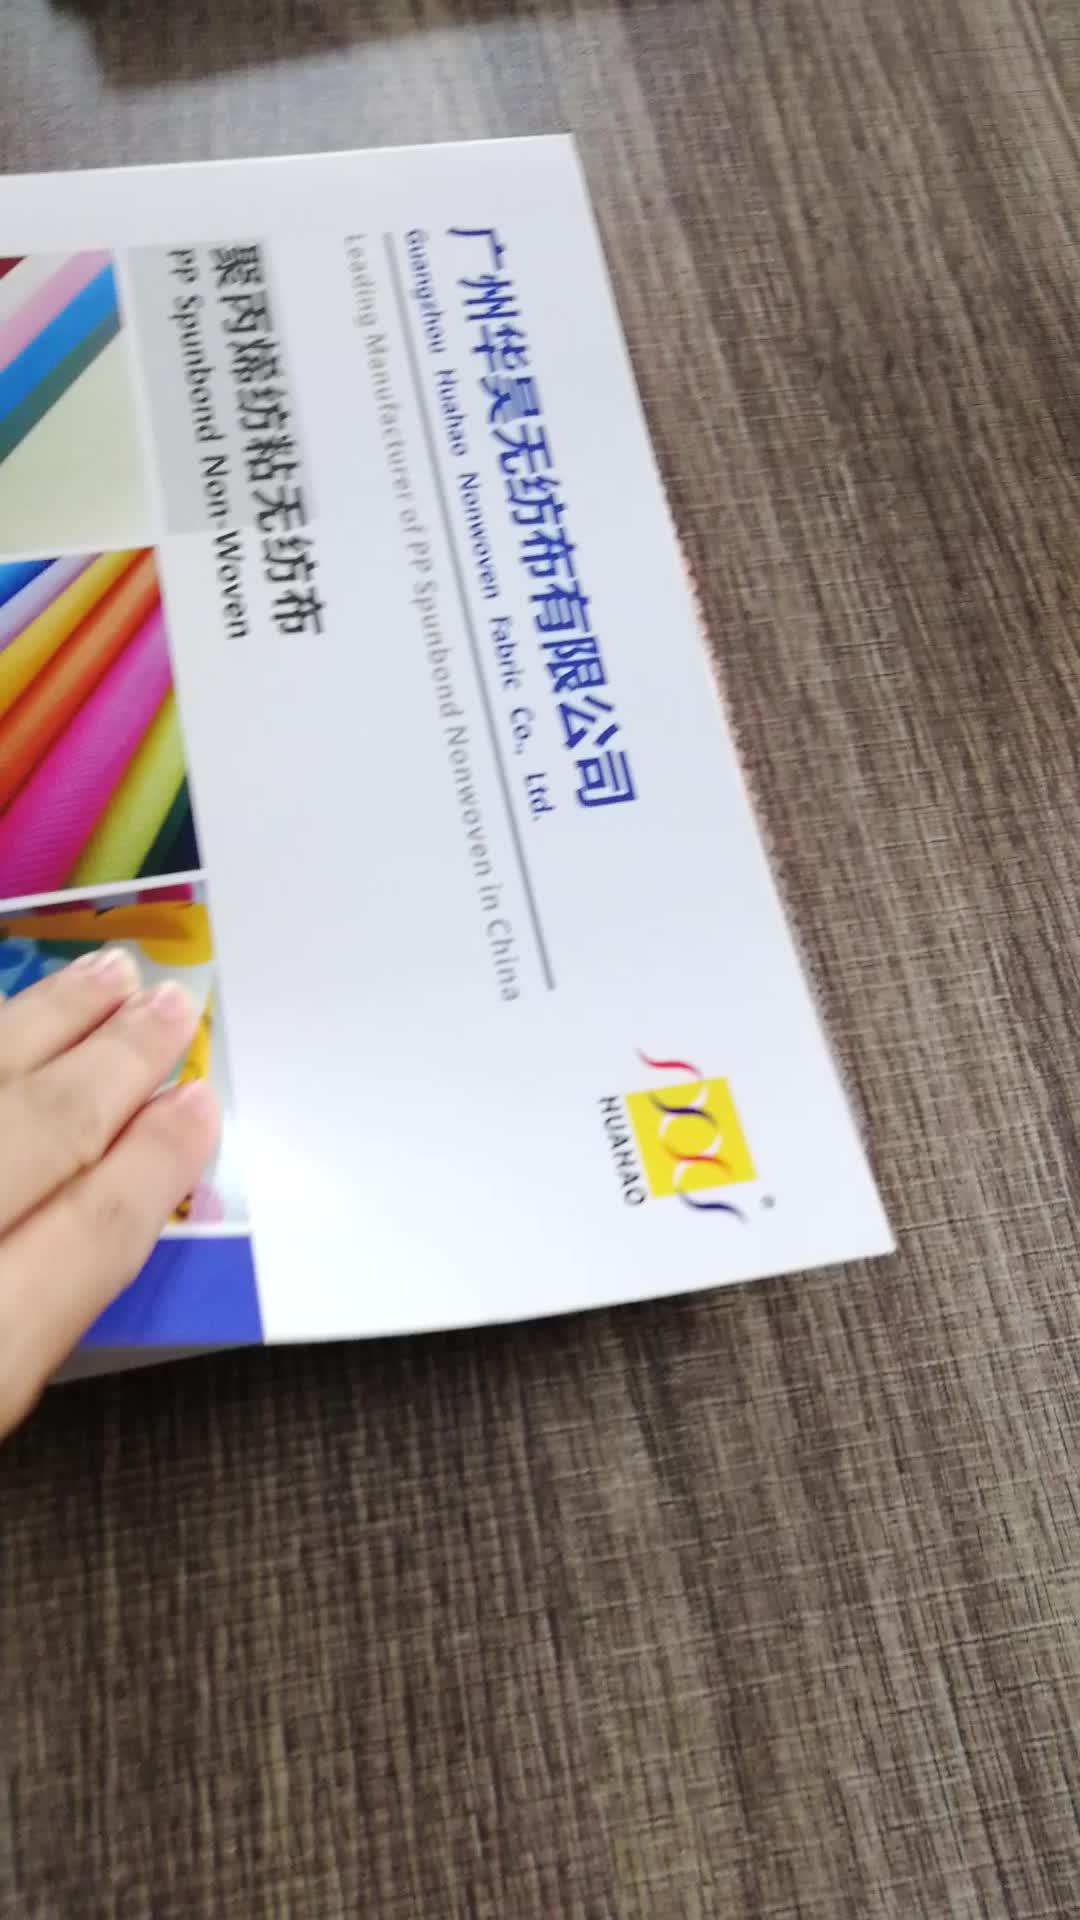 100% Polypropylene Spunbond Nonwoven Fabric For Sofa Upholstery